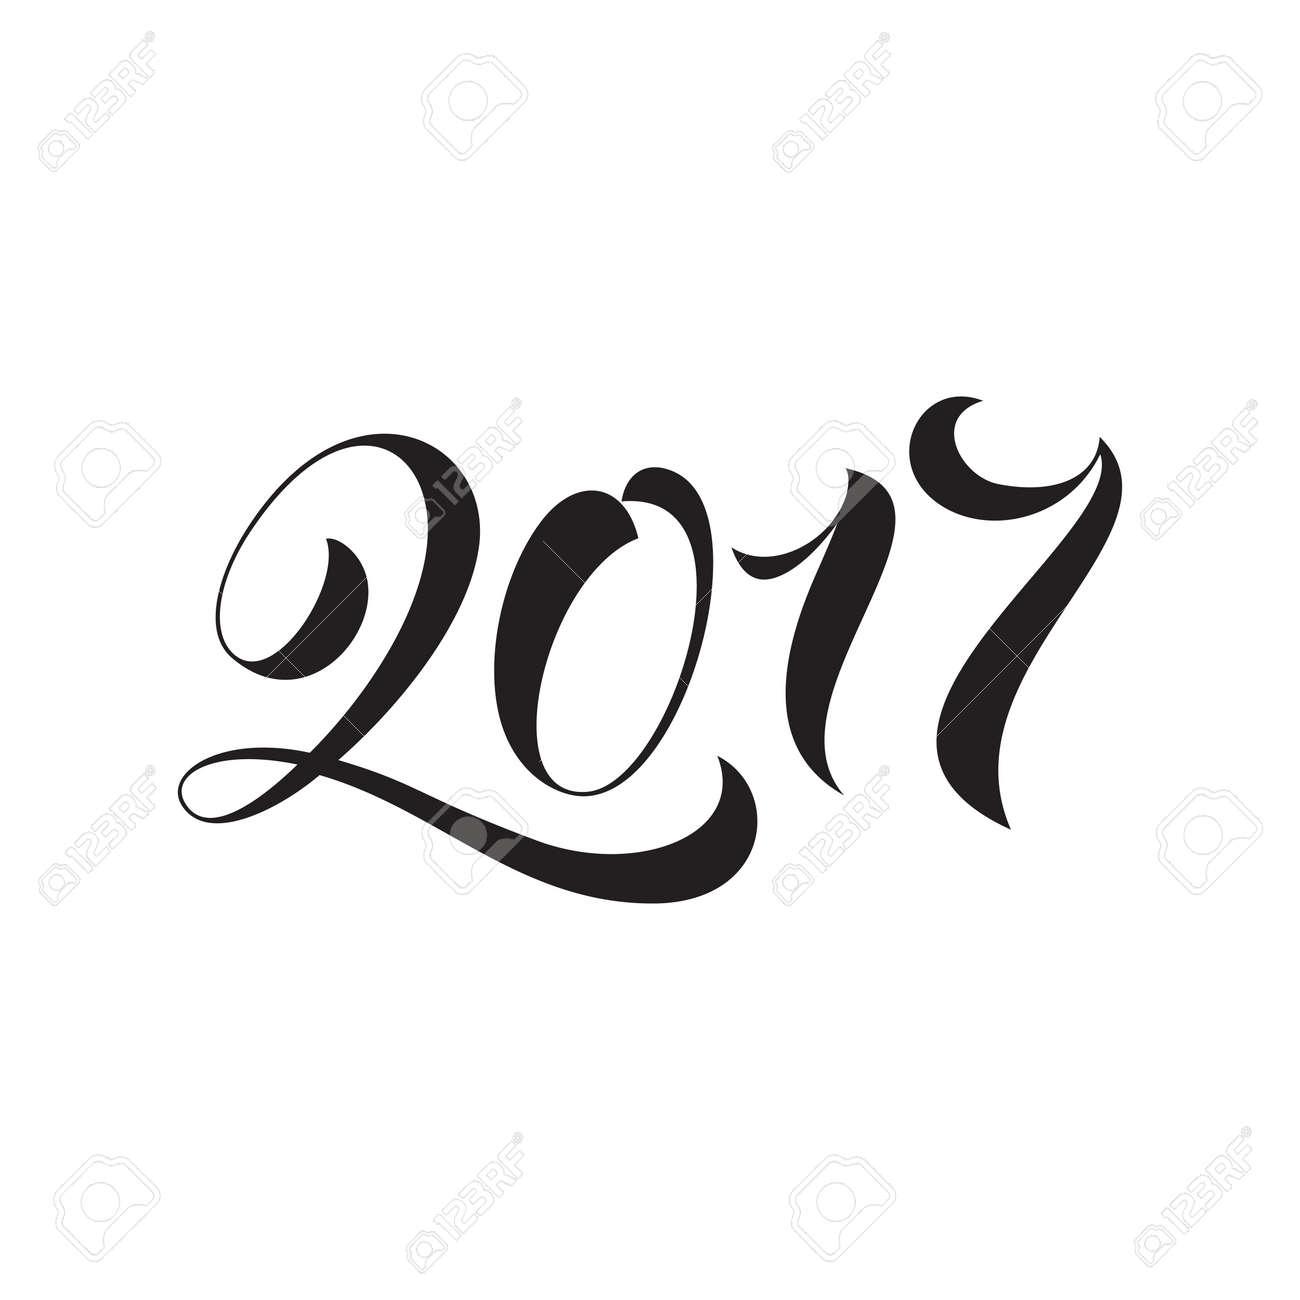 Guten Rutsch Ins Neue Jahr 2017-Schriftzug Feiertagsgrußkarte ...